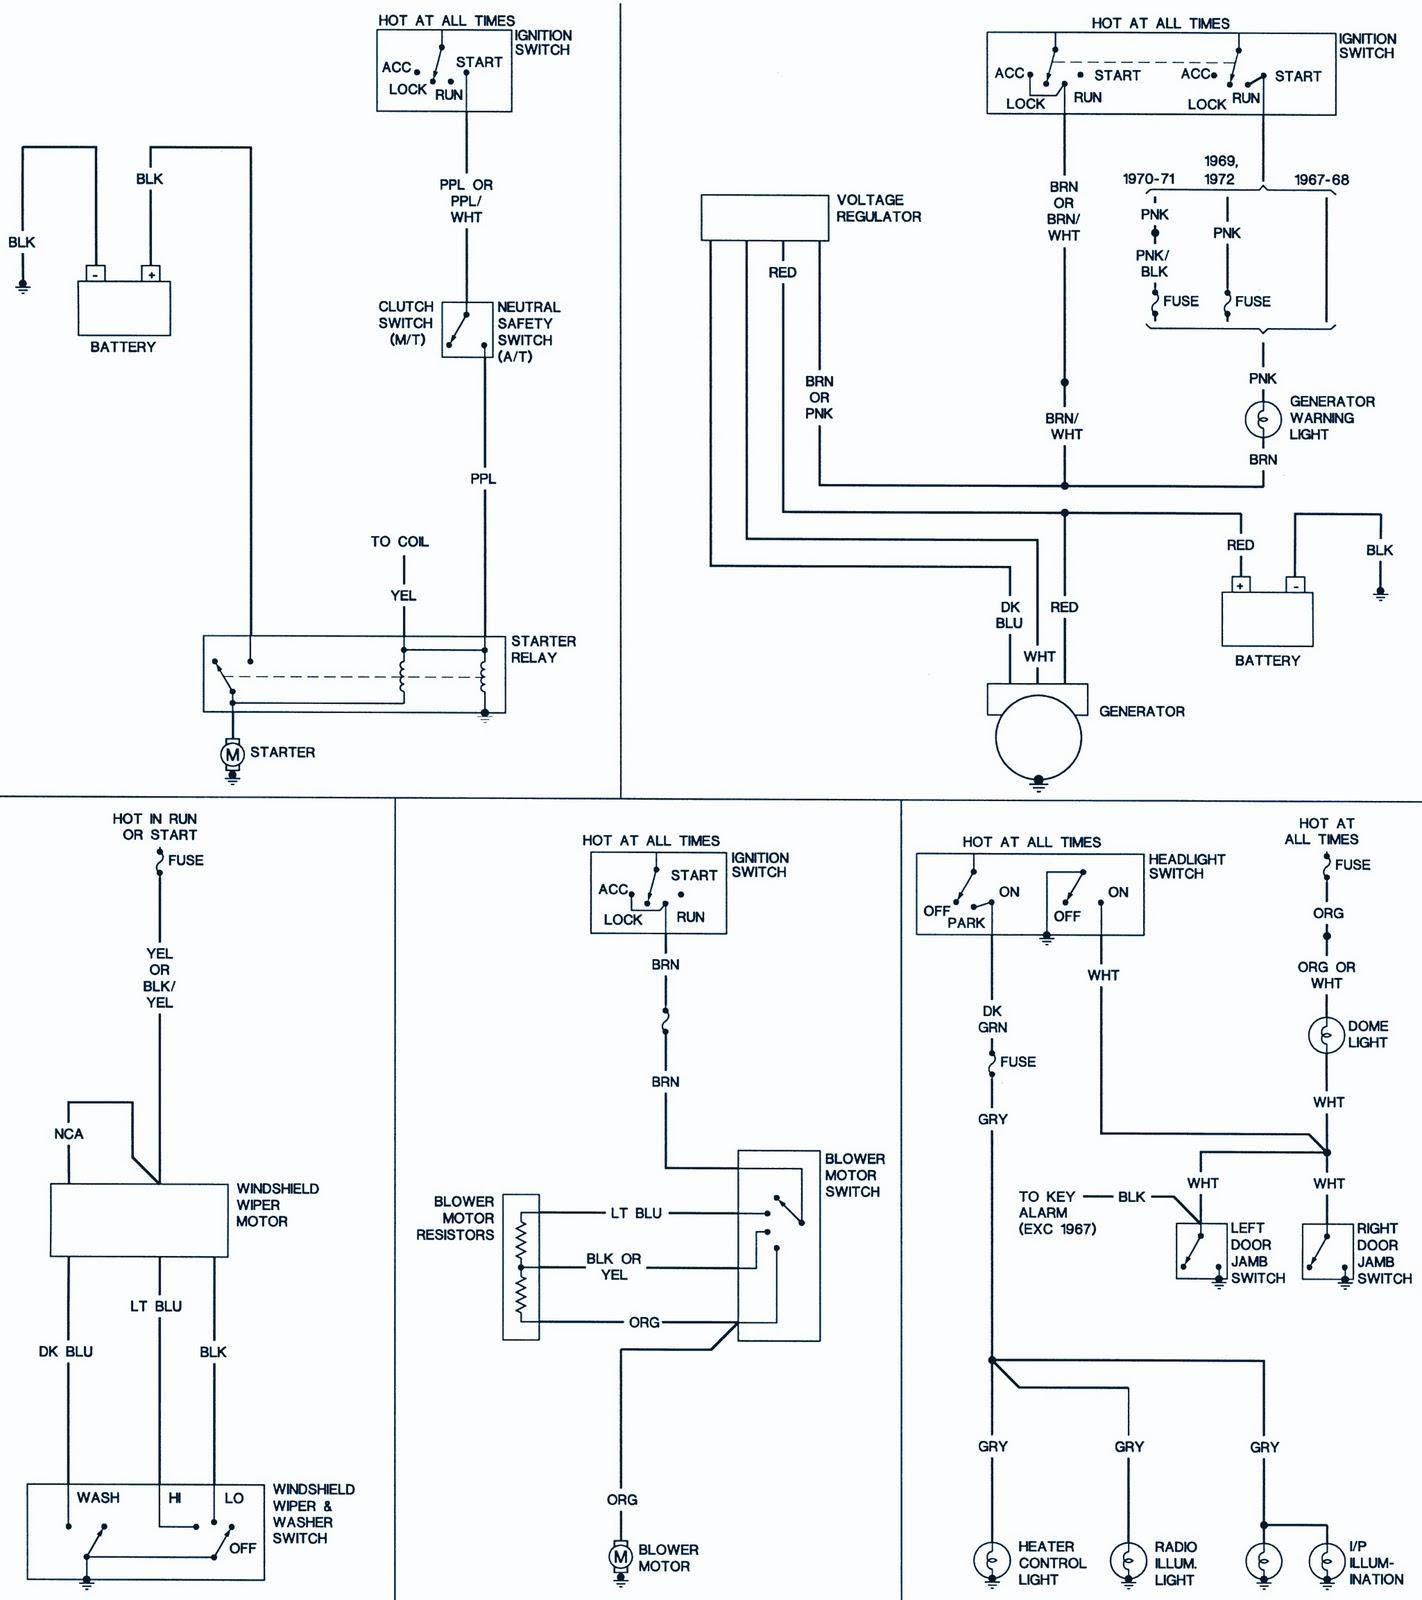 2013 Chevy Impala Light Wiring Diagram 06 Rubicon Locker Wiring Diagram Compressor Tos30 Lanjut Wa1 Jeanjaures37 Fr